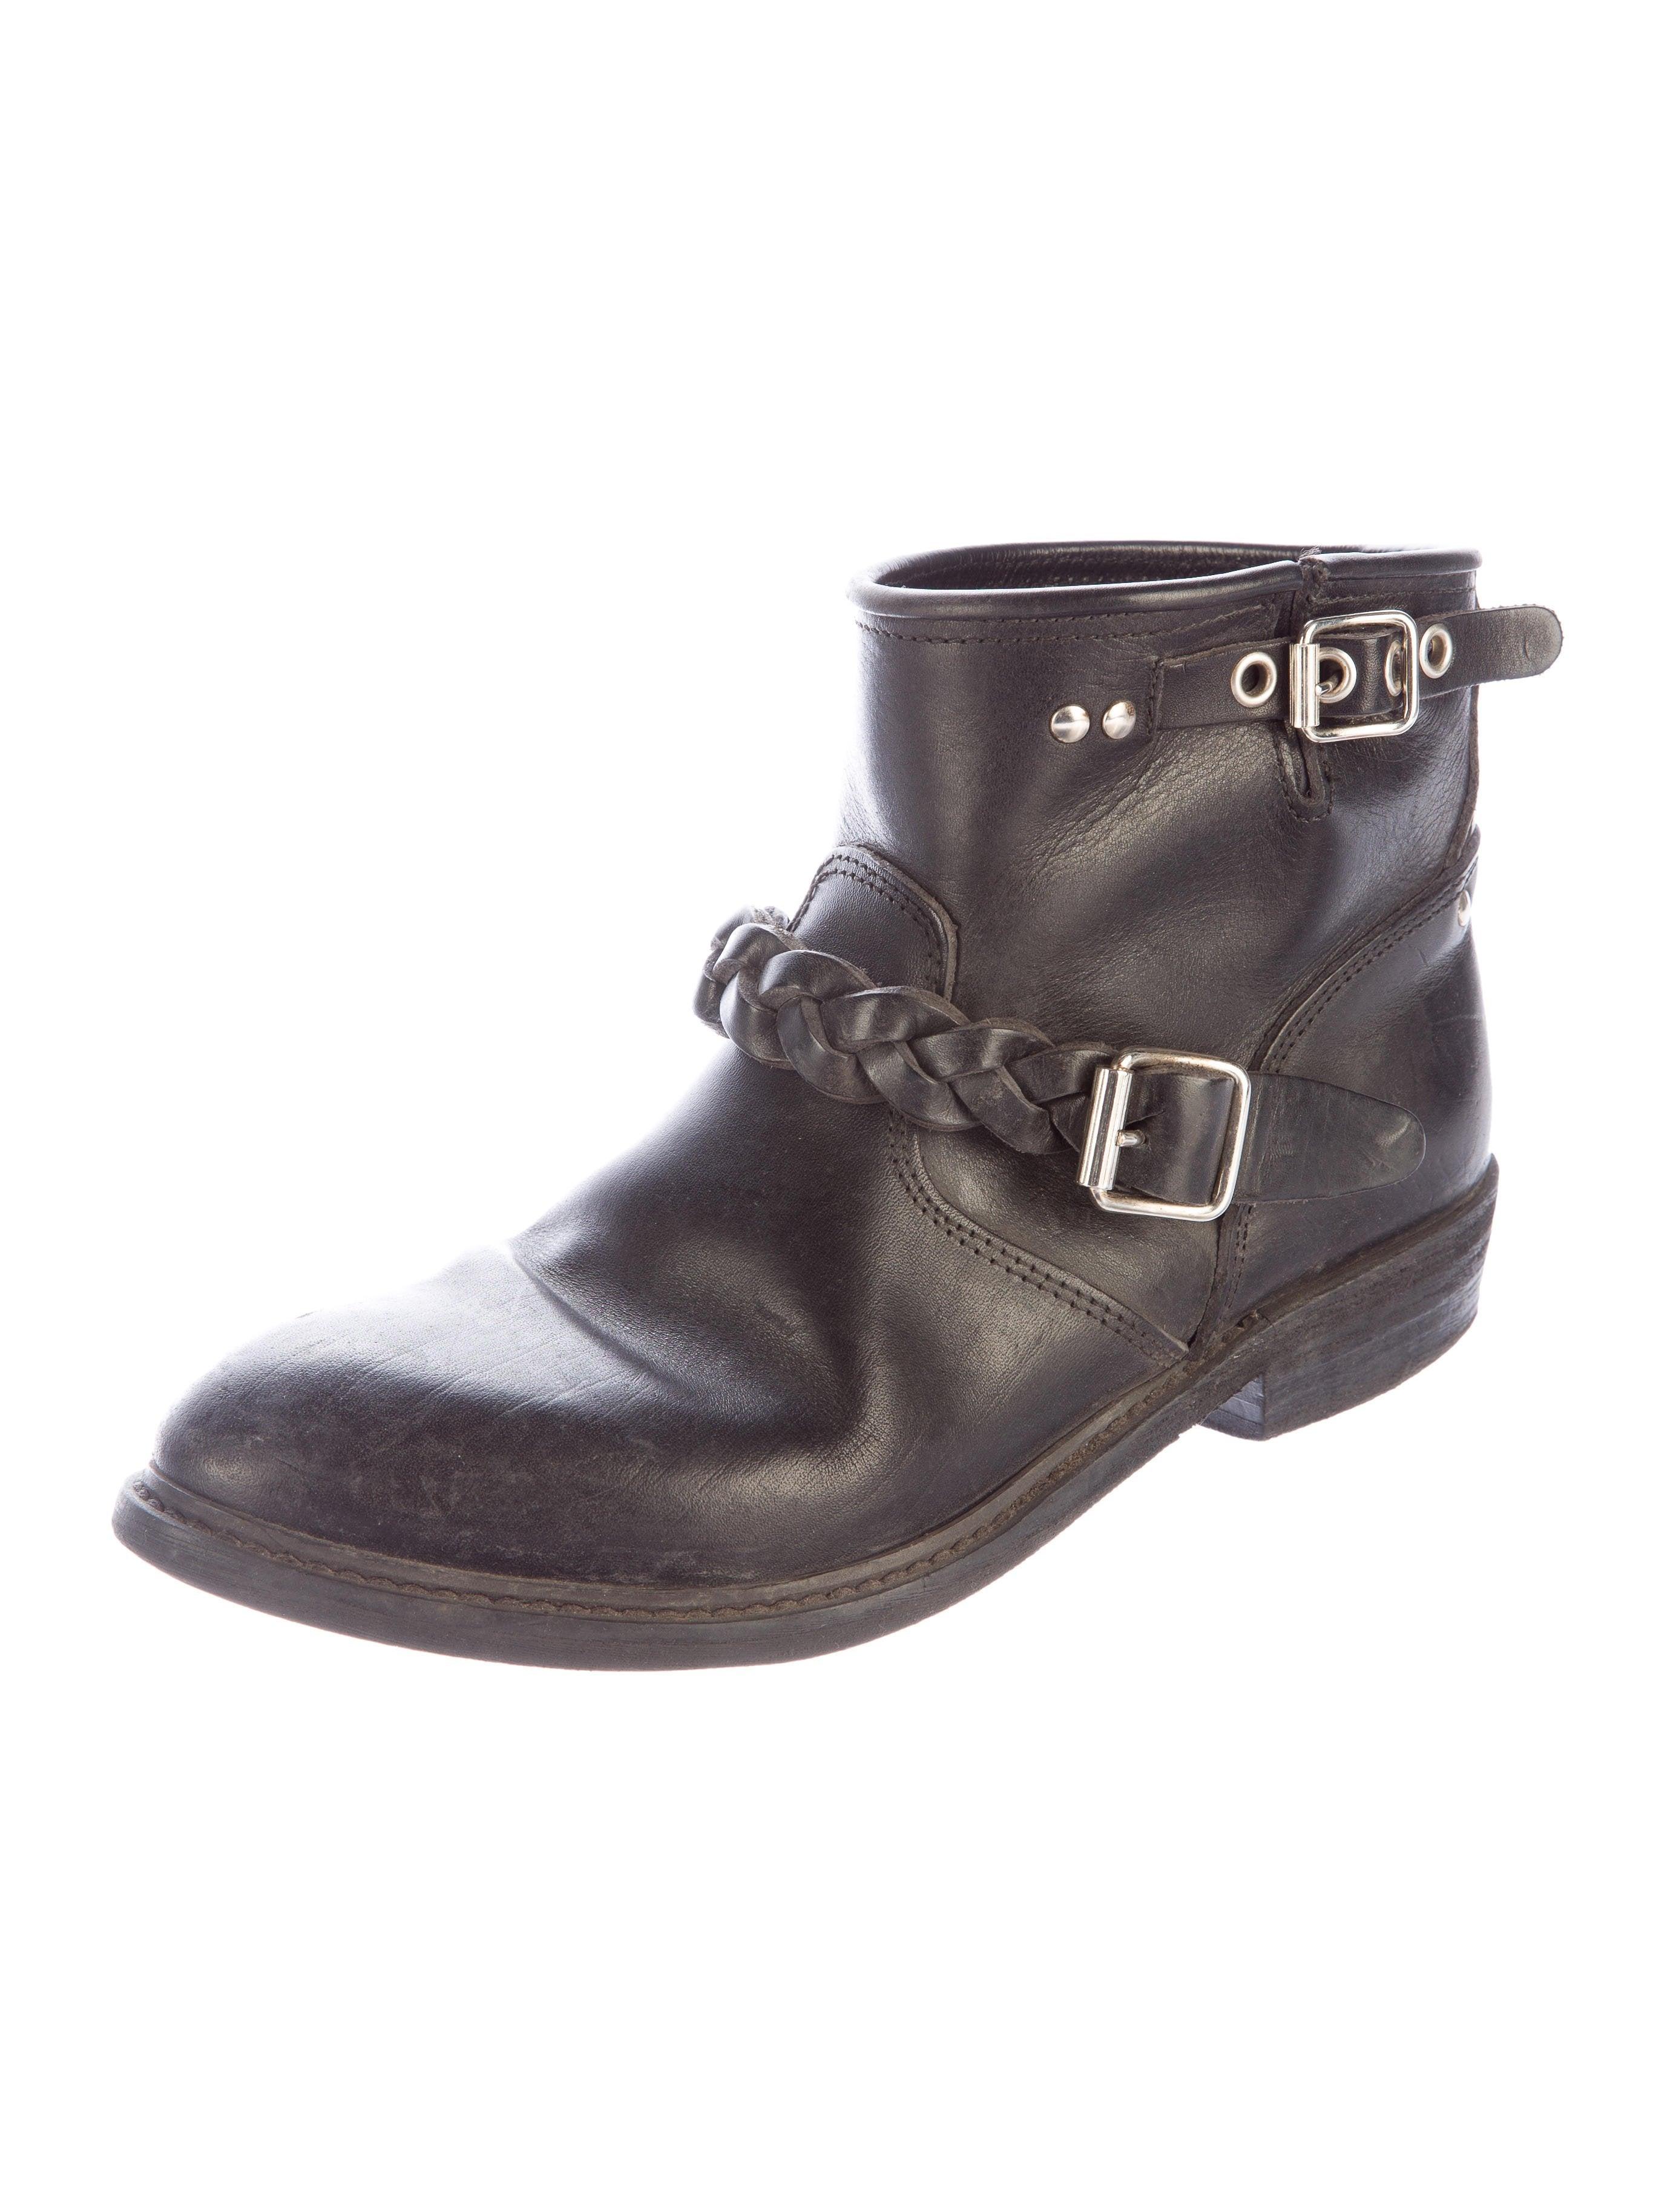 golden goose leather biker ankle boots shoes wg523262 the realreal. Black Bedroom Furniture Sets. Home Design Ideas